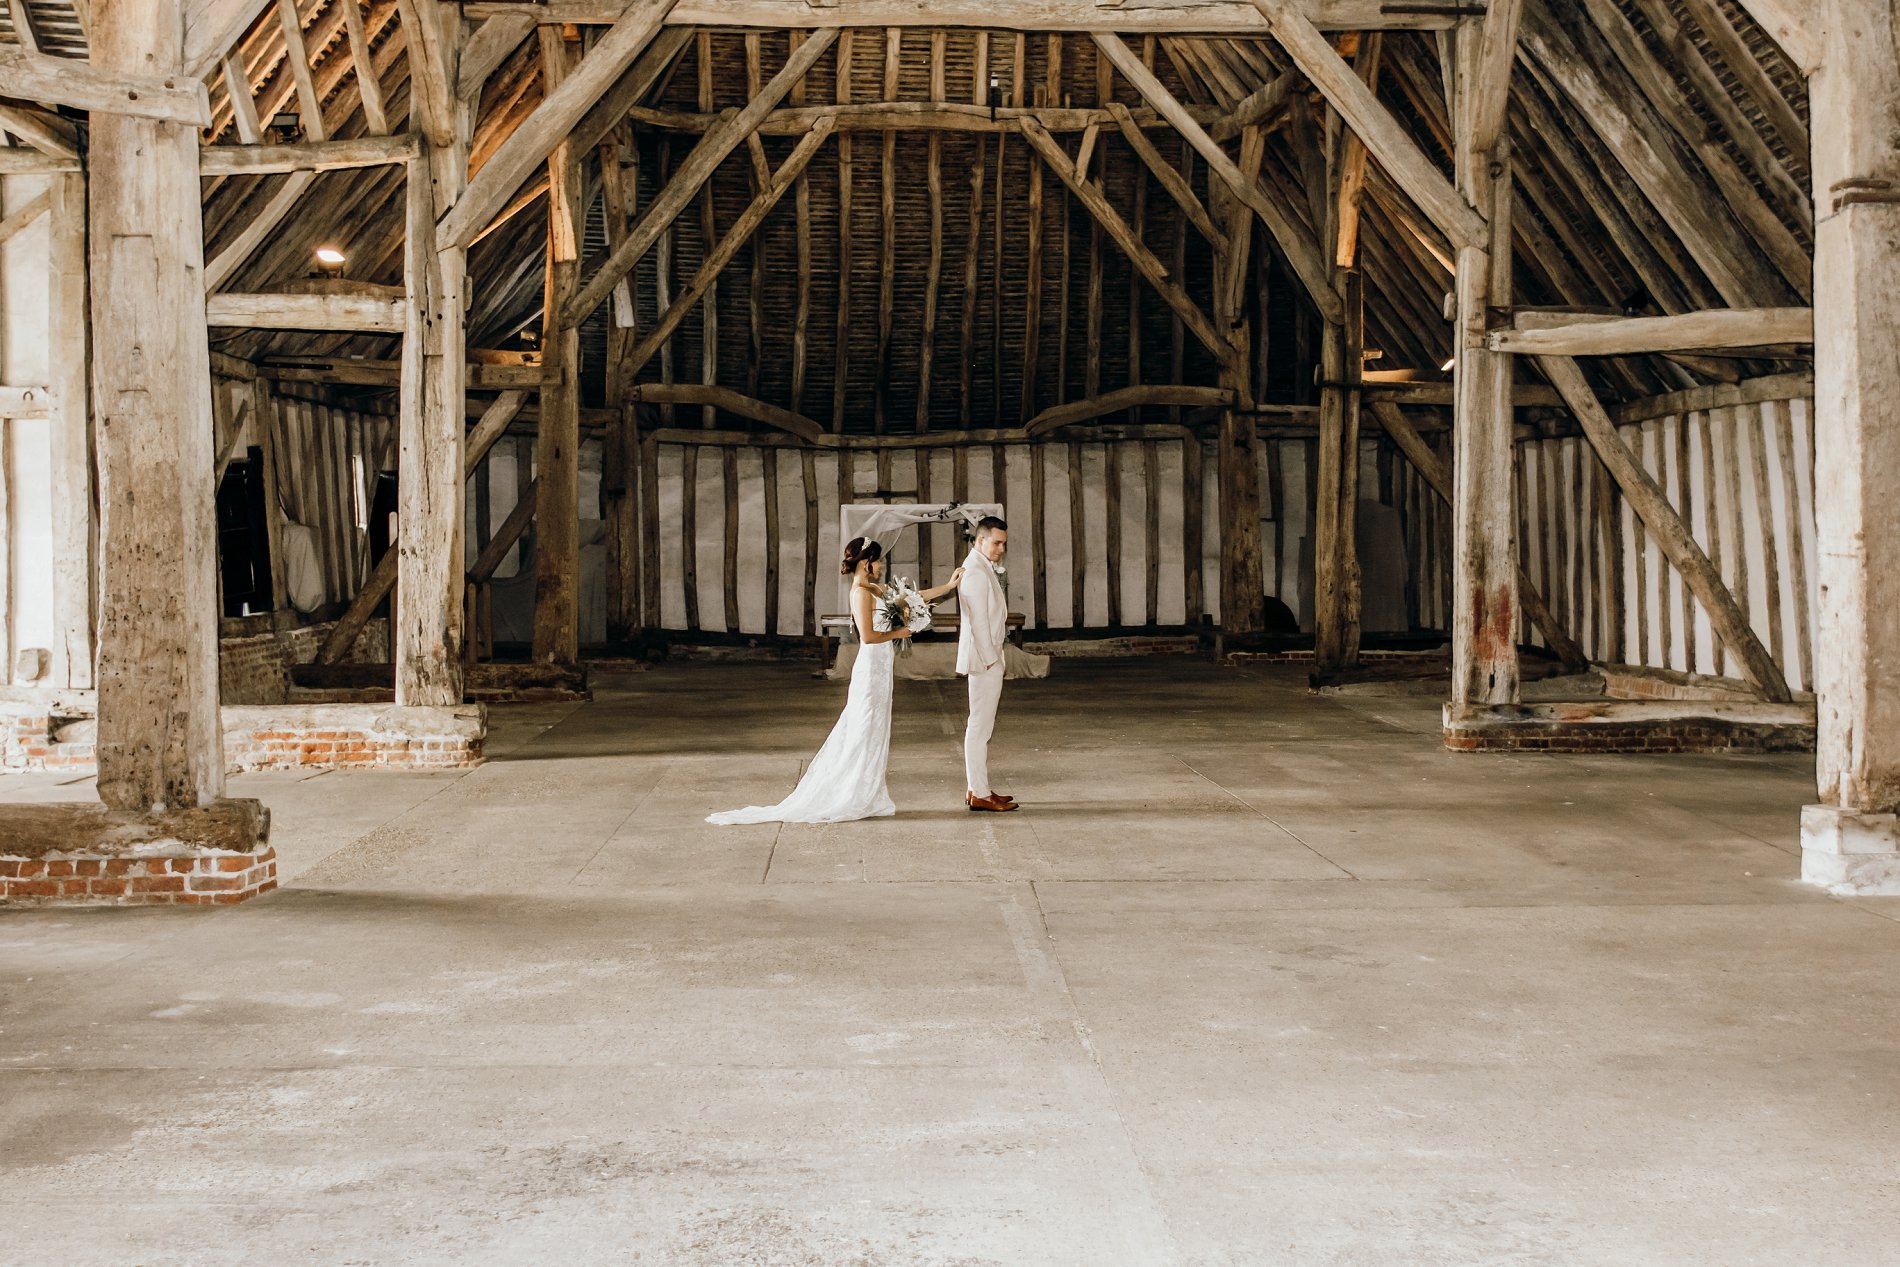 A Golden Boho Wedding Shoot at Cressing Temple Barns (c) Kate Boston Photography (35)